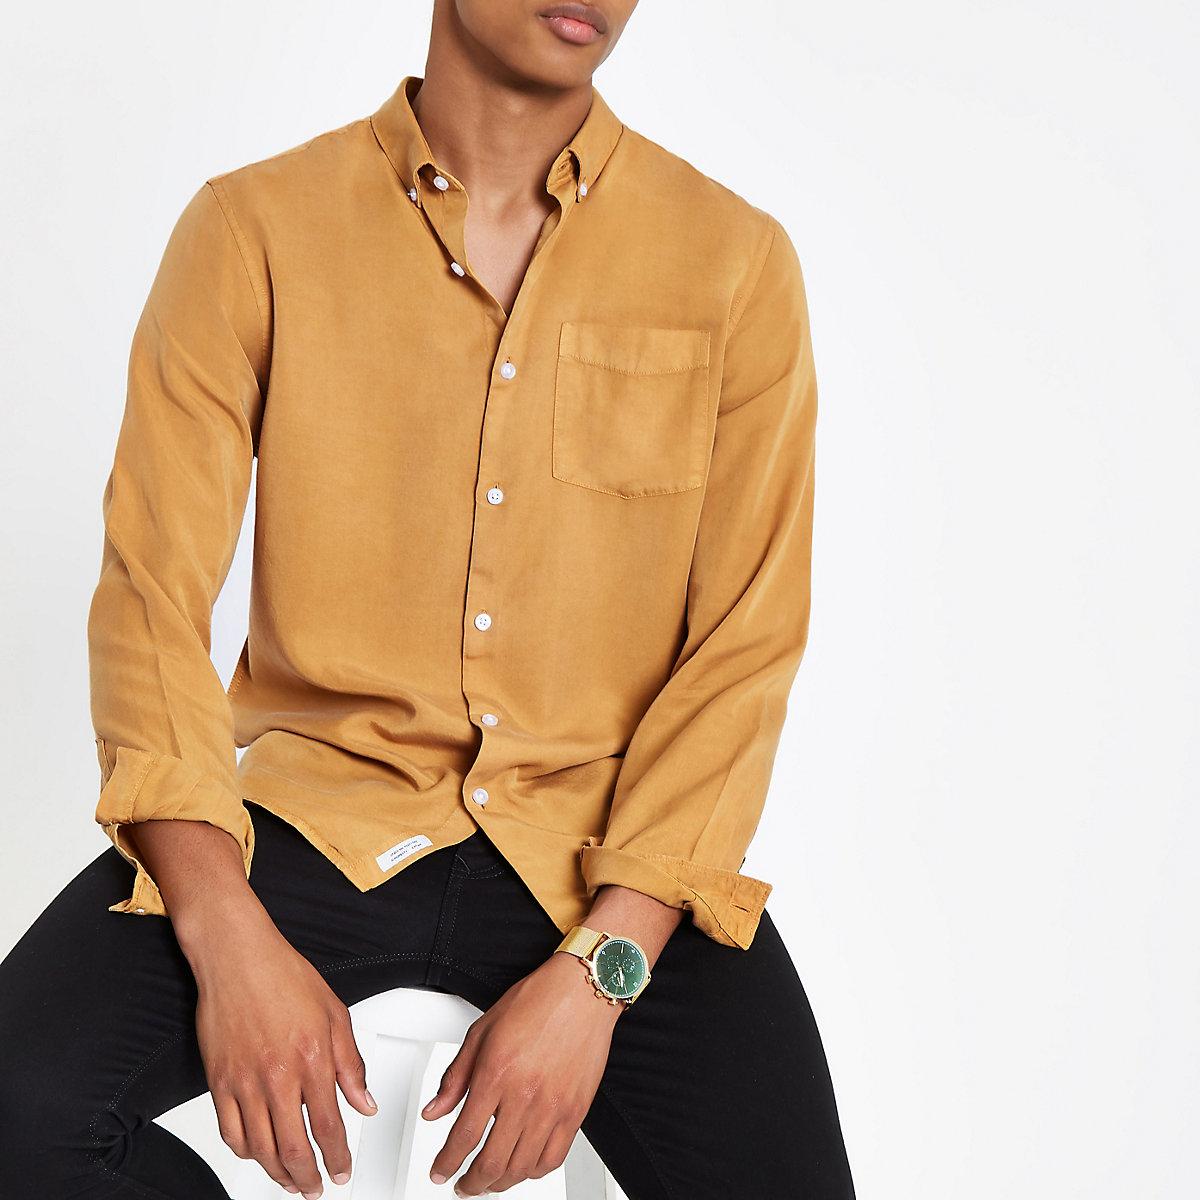 Mustard yellow long sleeve shirt